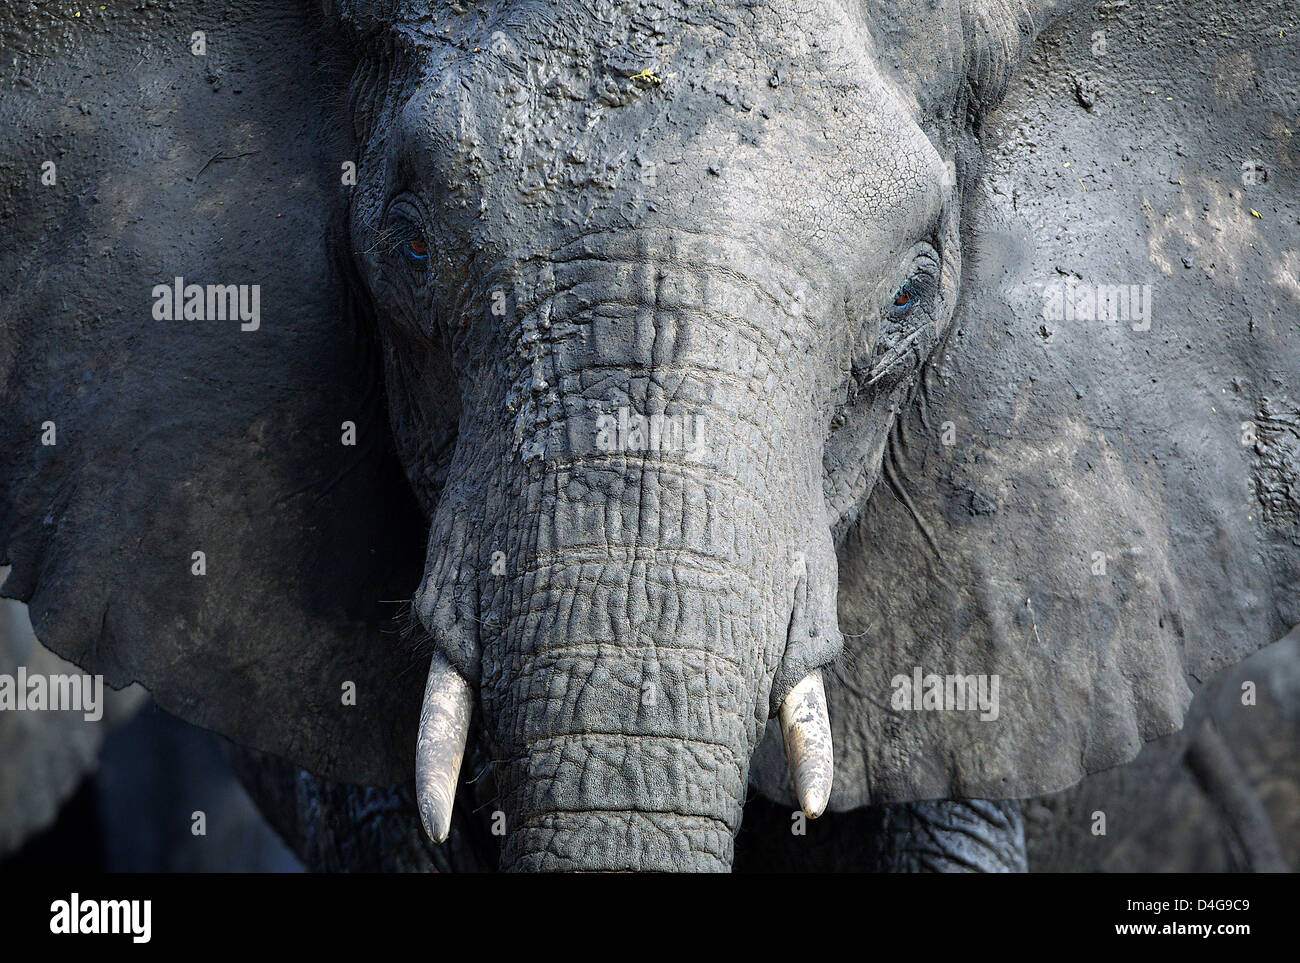 Close up of African elephant TANZANIA - Stock Image